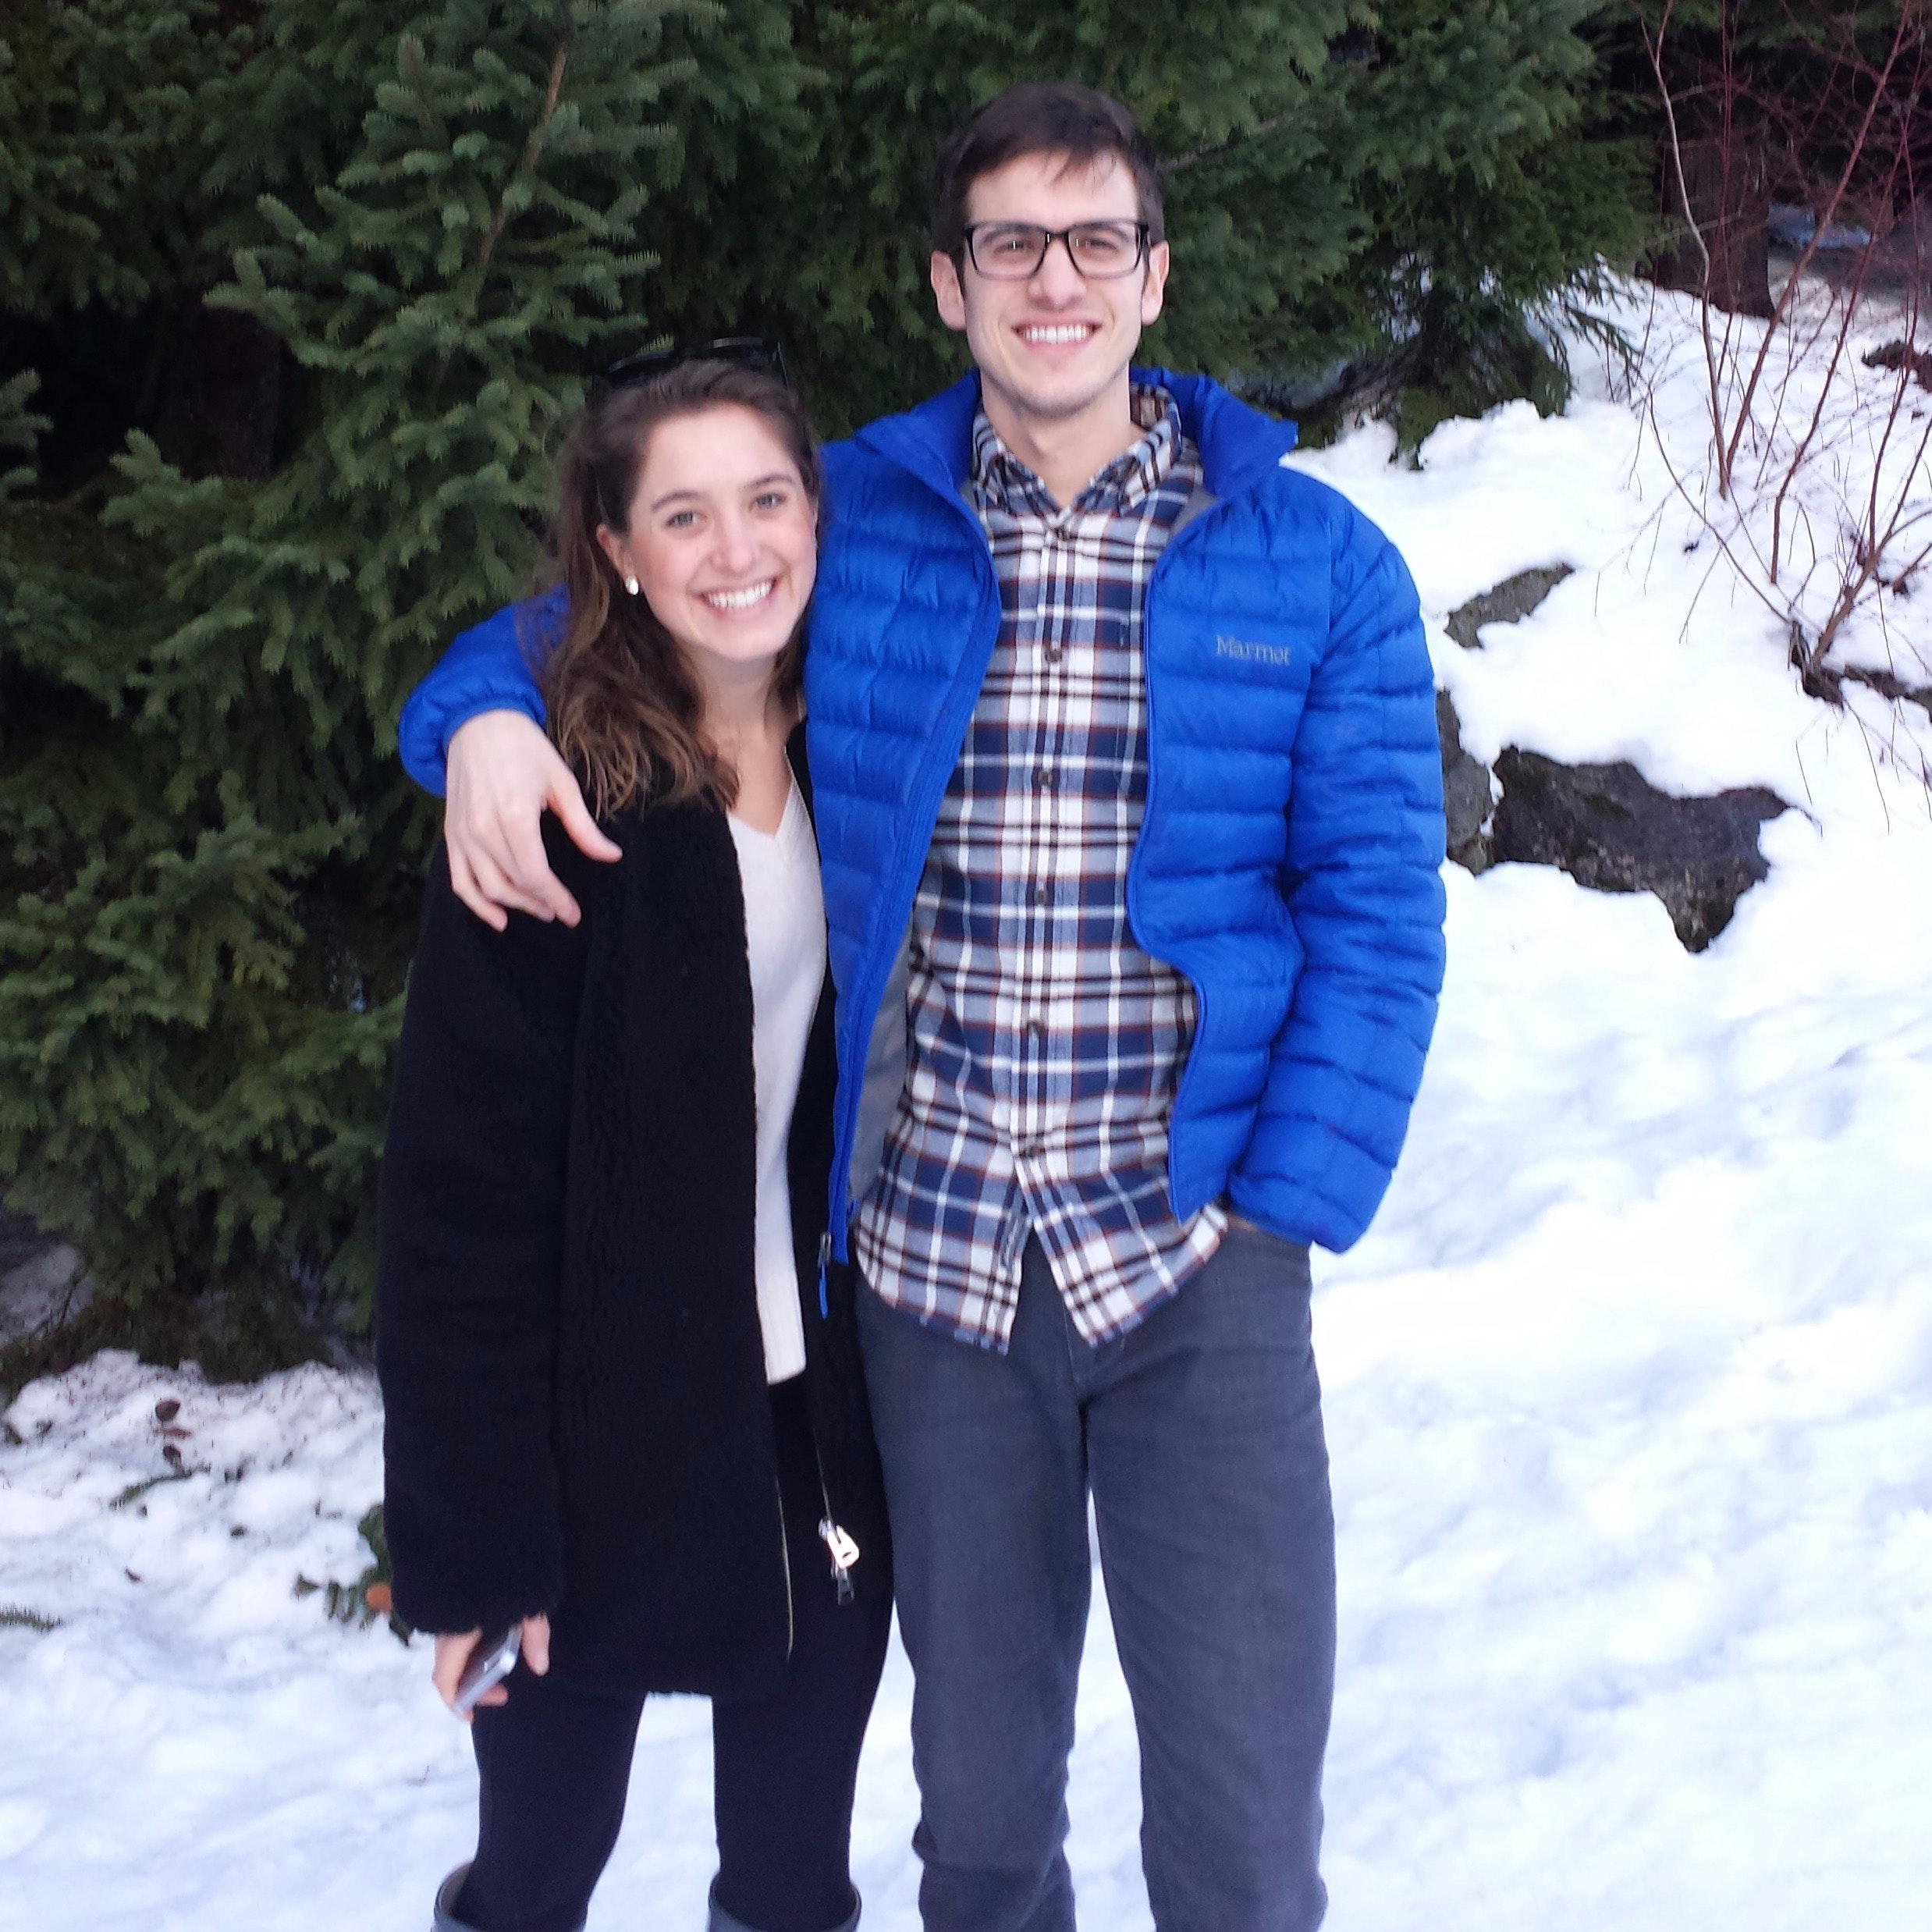 Tyler & Kendra M.